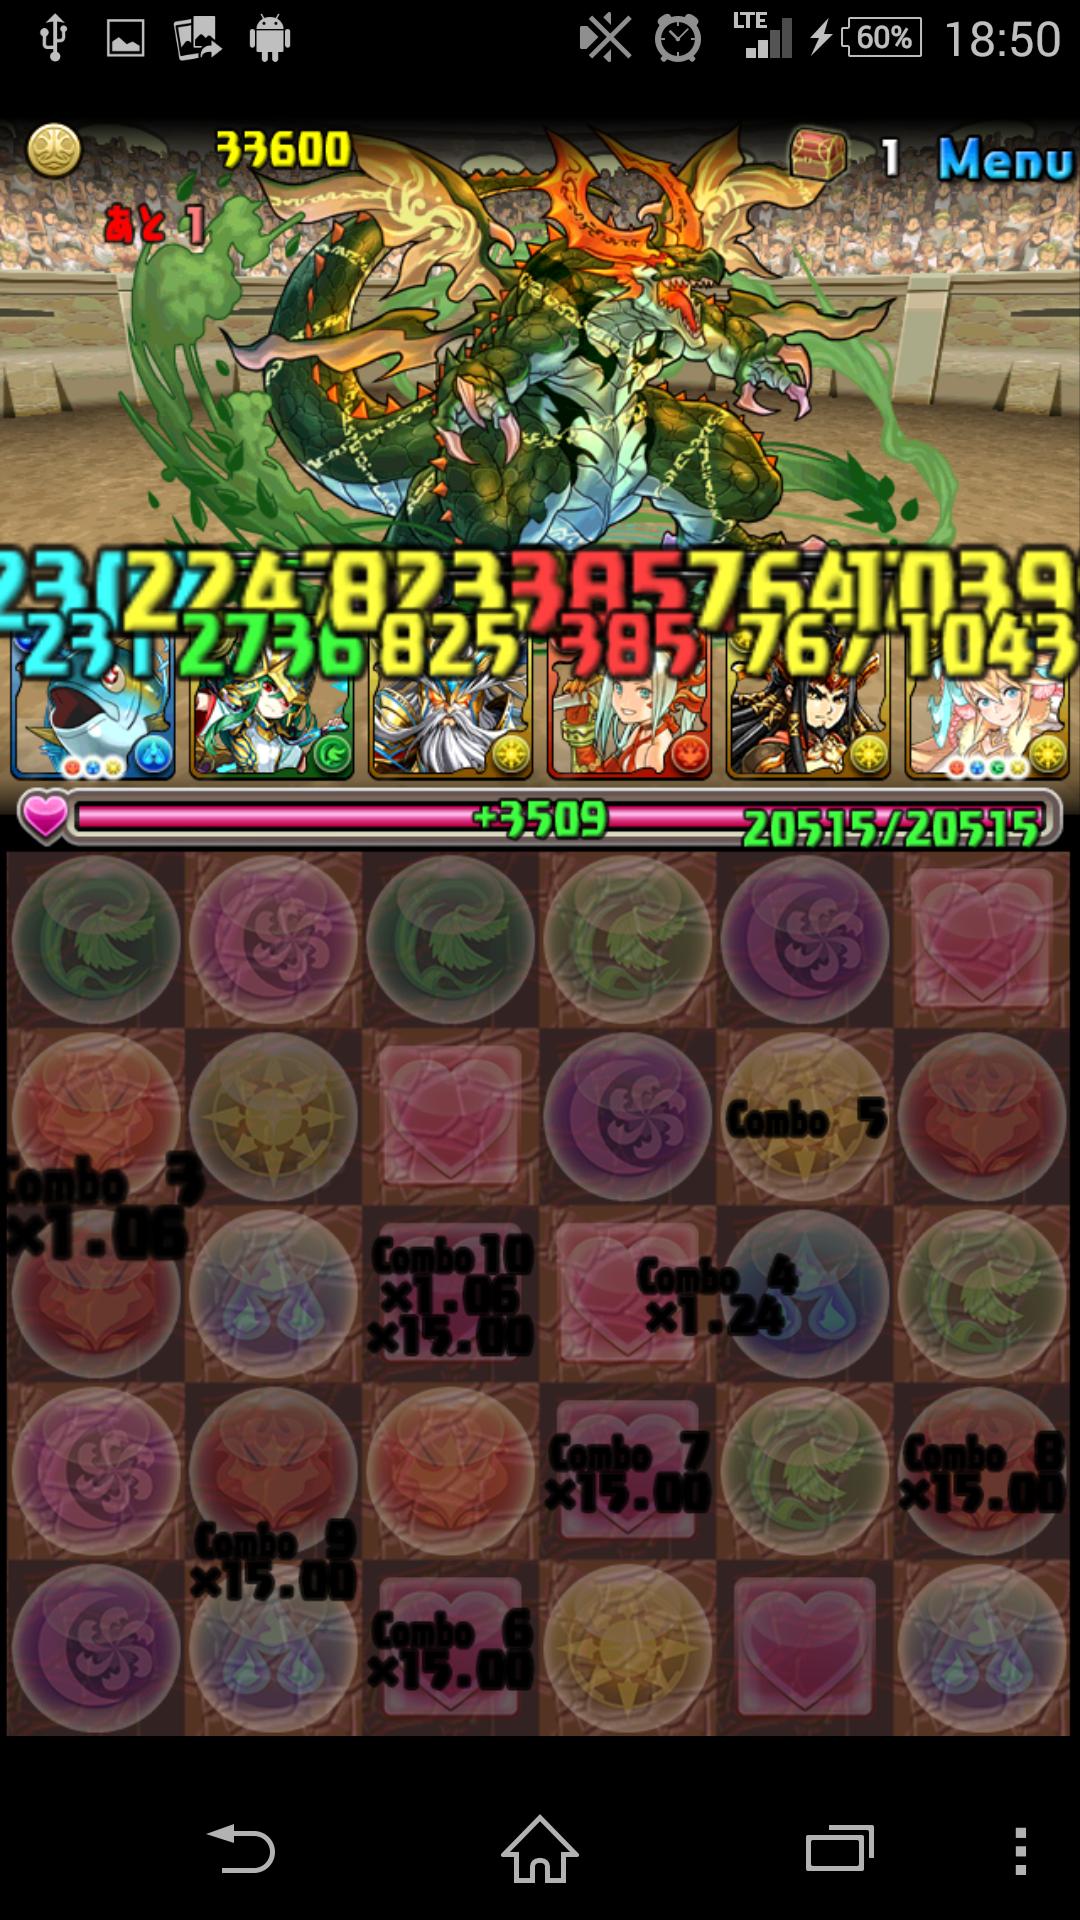 Screenshot_2014-09-09-18-50-36.png